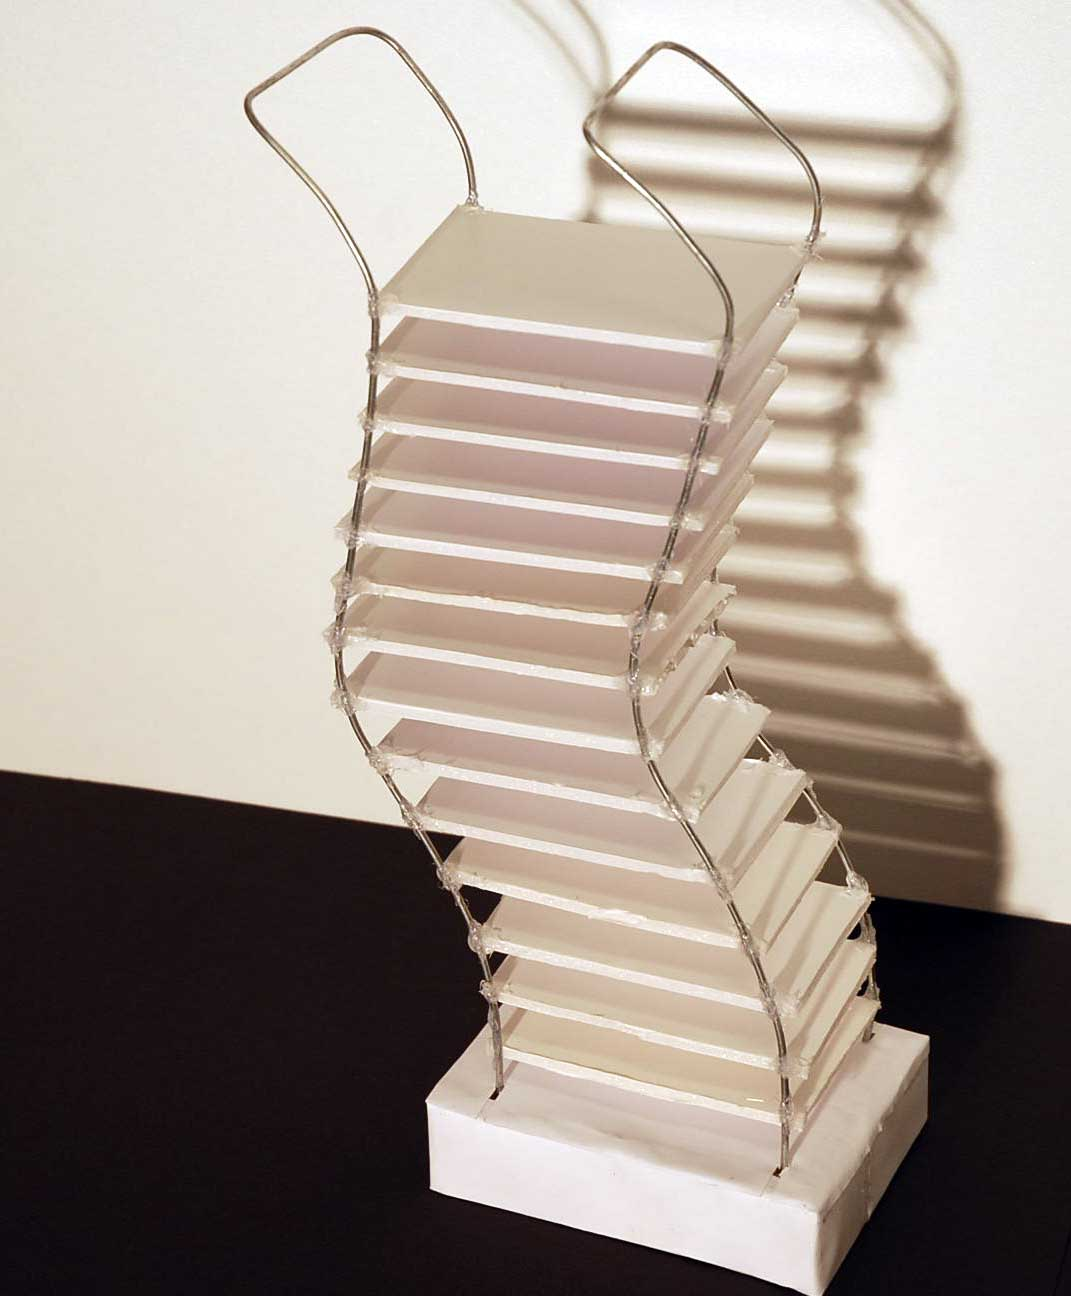 Joona Lappalainen prototyyppi 2008